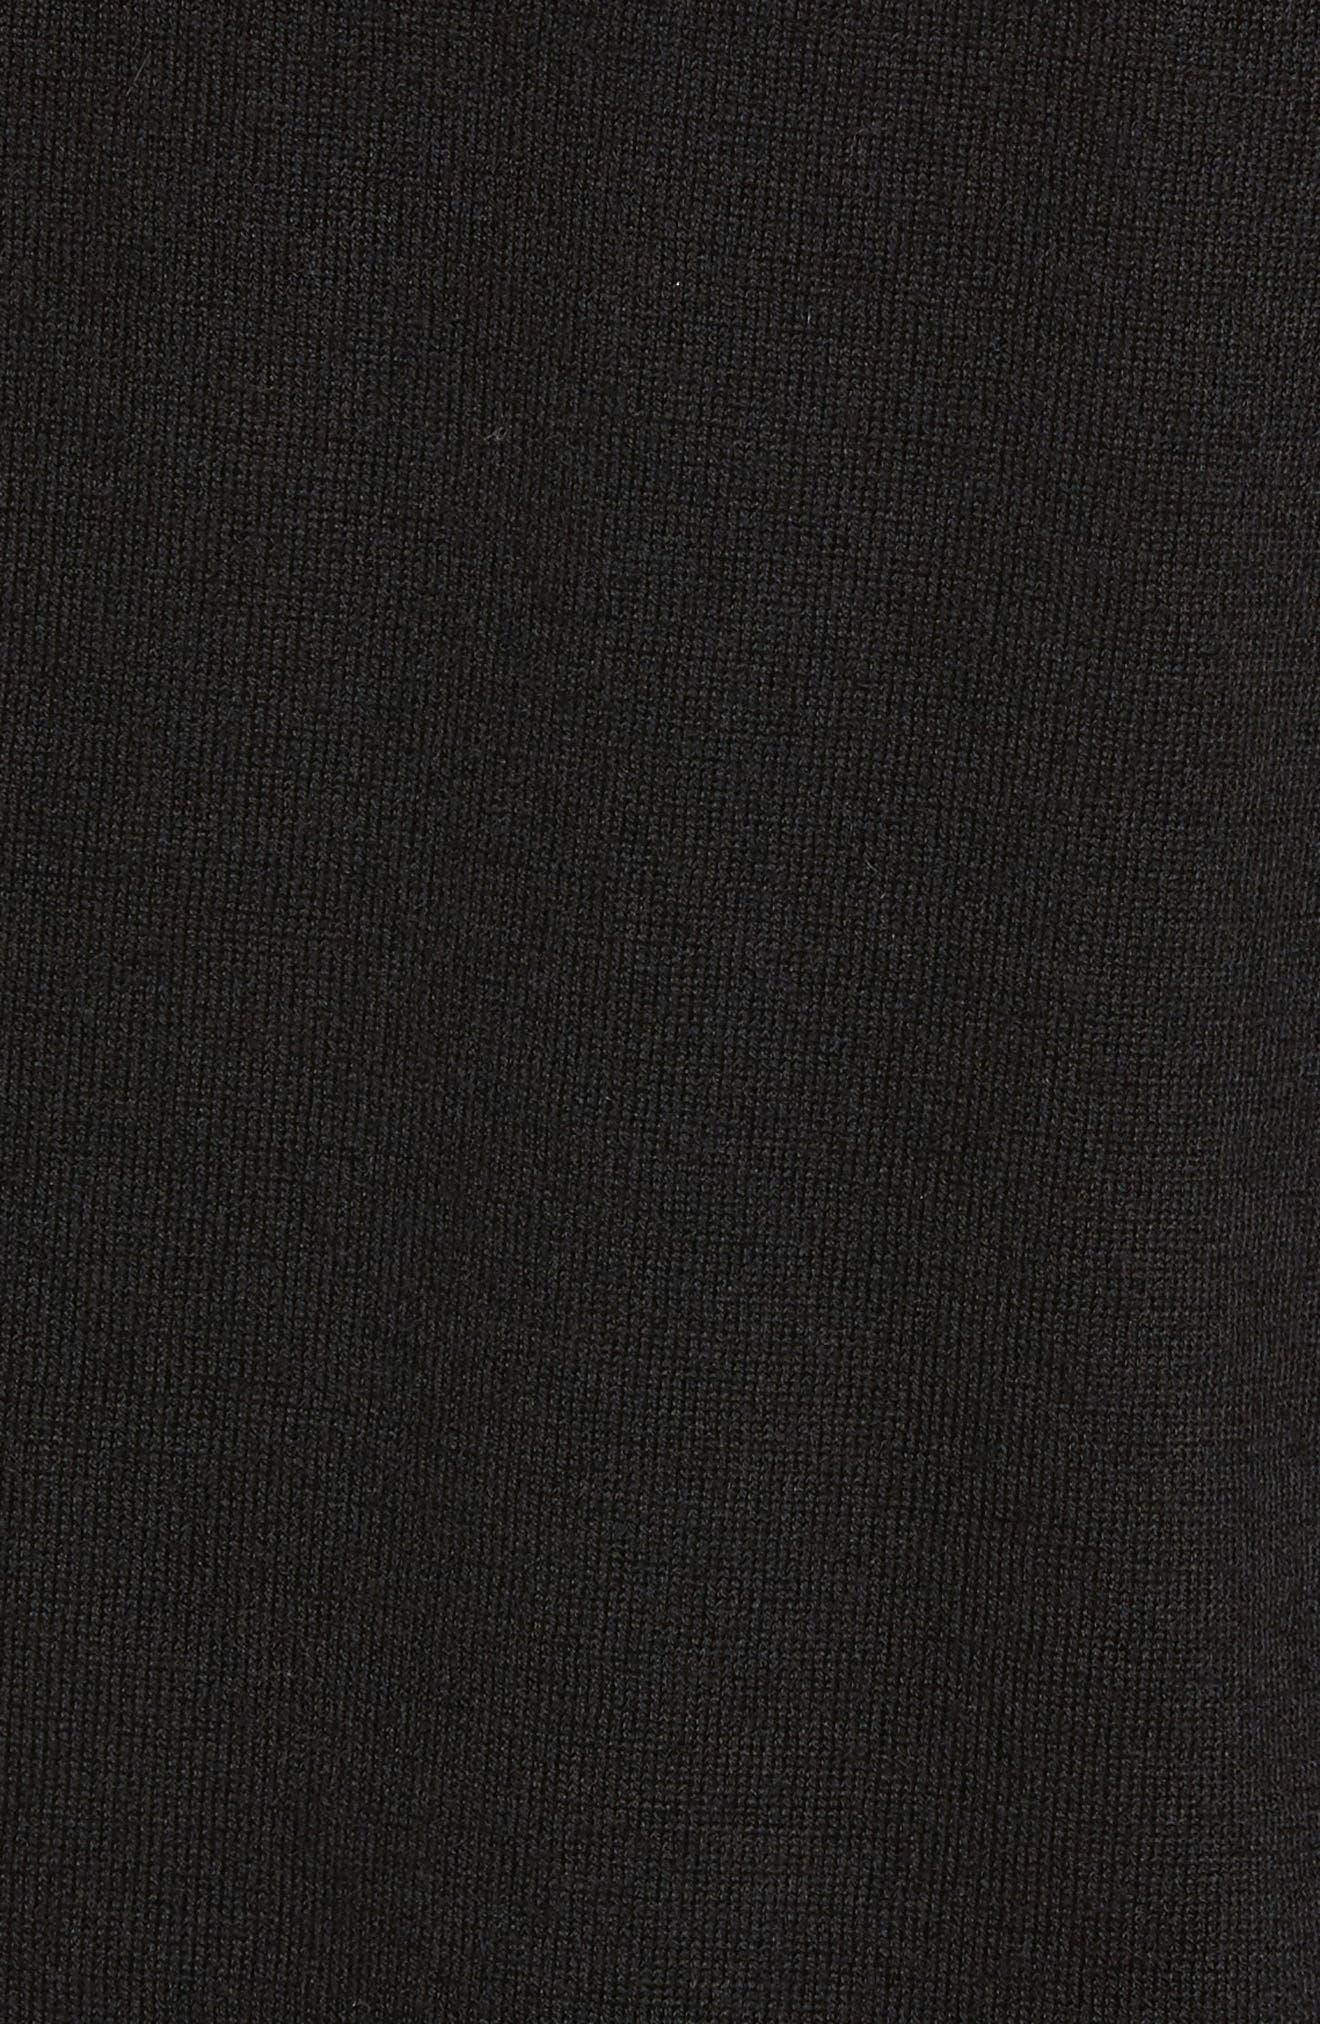 Wool & Cashmere Hoodie,                             Alternate thumbnail 5, color,                             Black